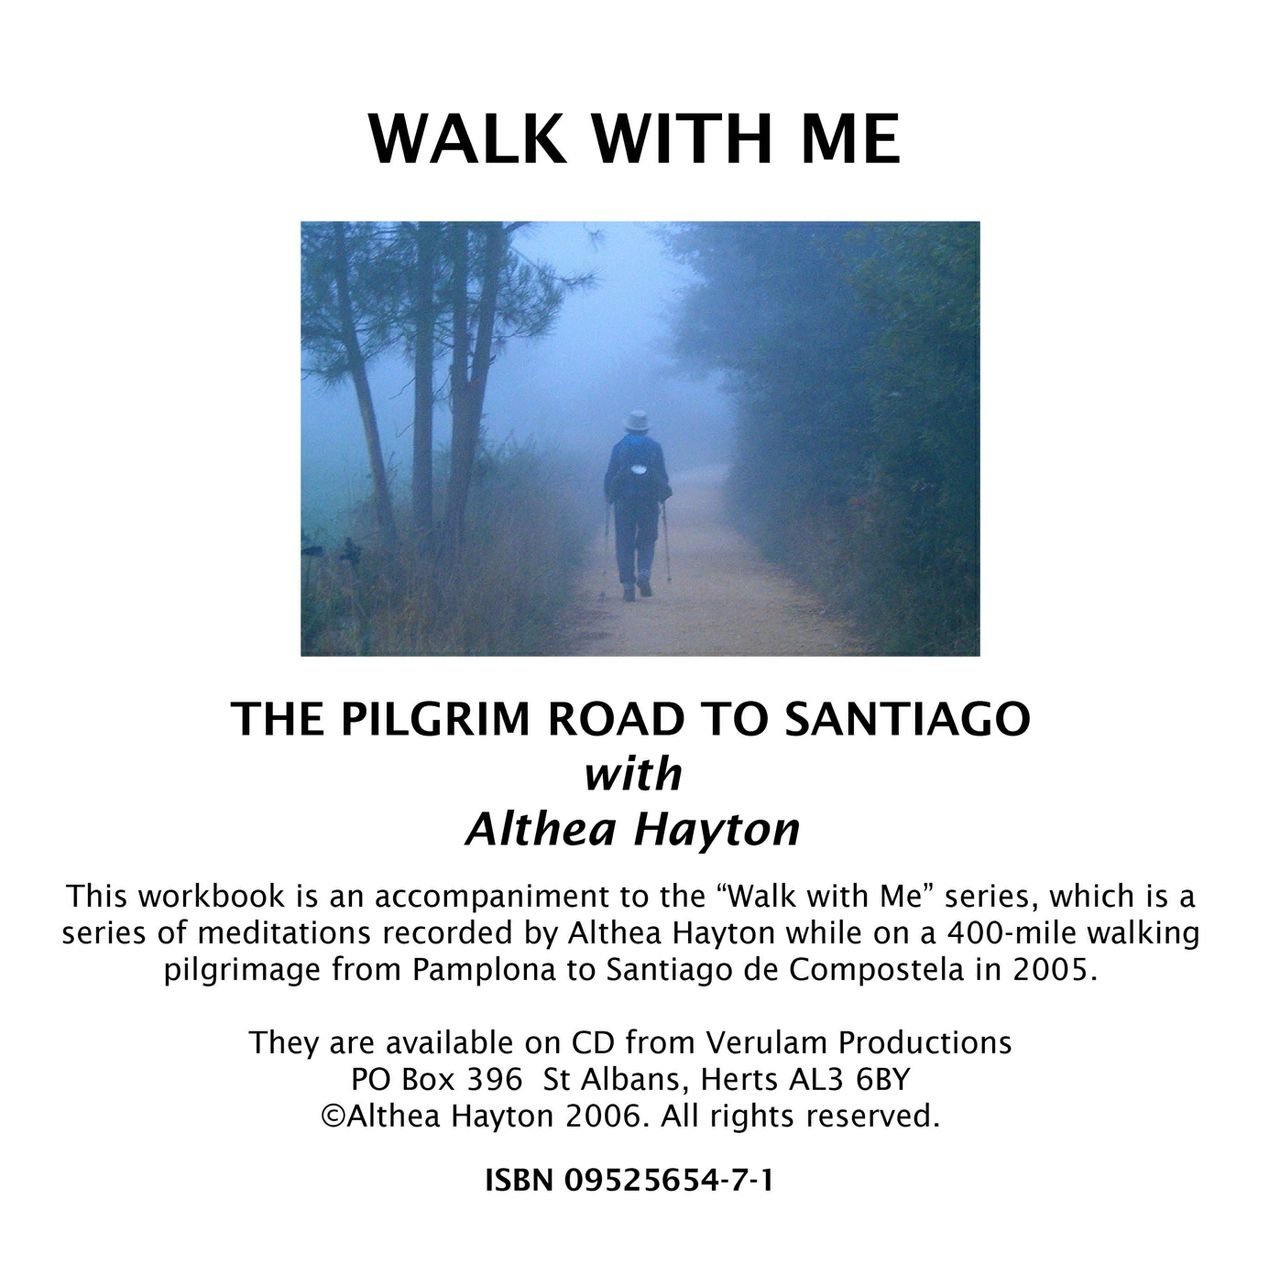 Walk with me -The pilgrim road to Santiago with Althea Hayton